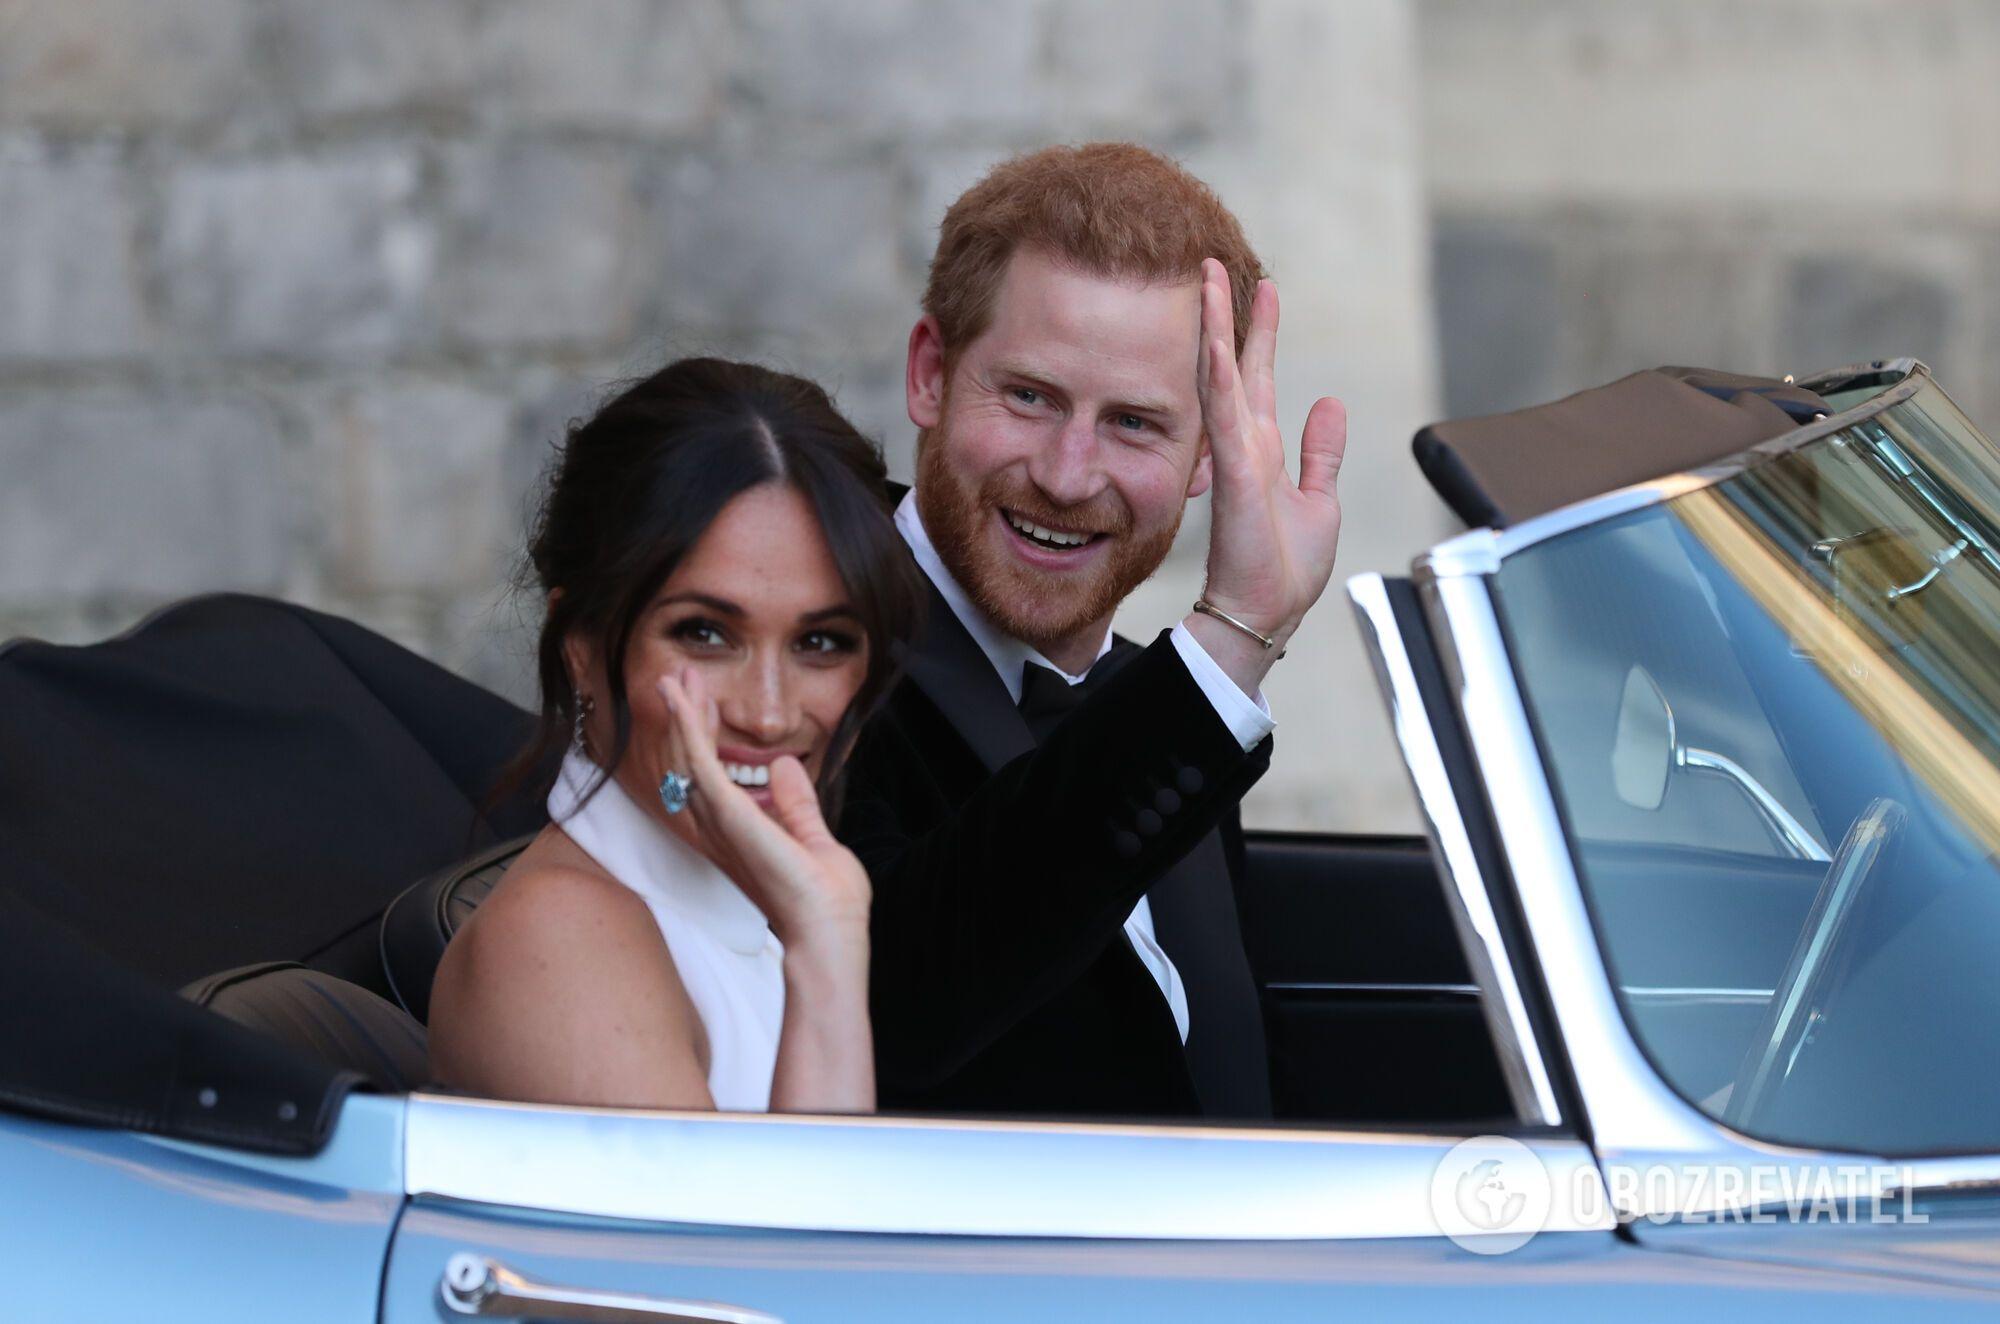 Свадьба принца Гарри и Меган Маркл: все подробности